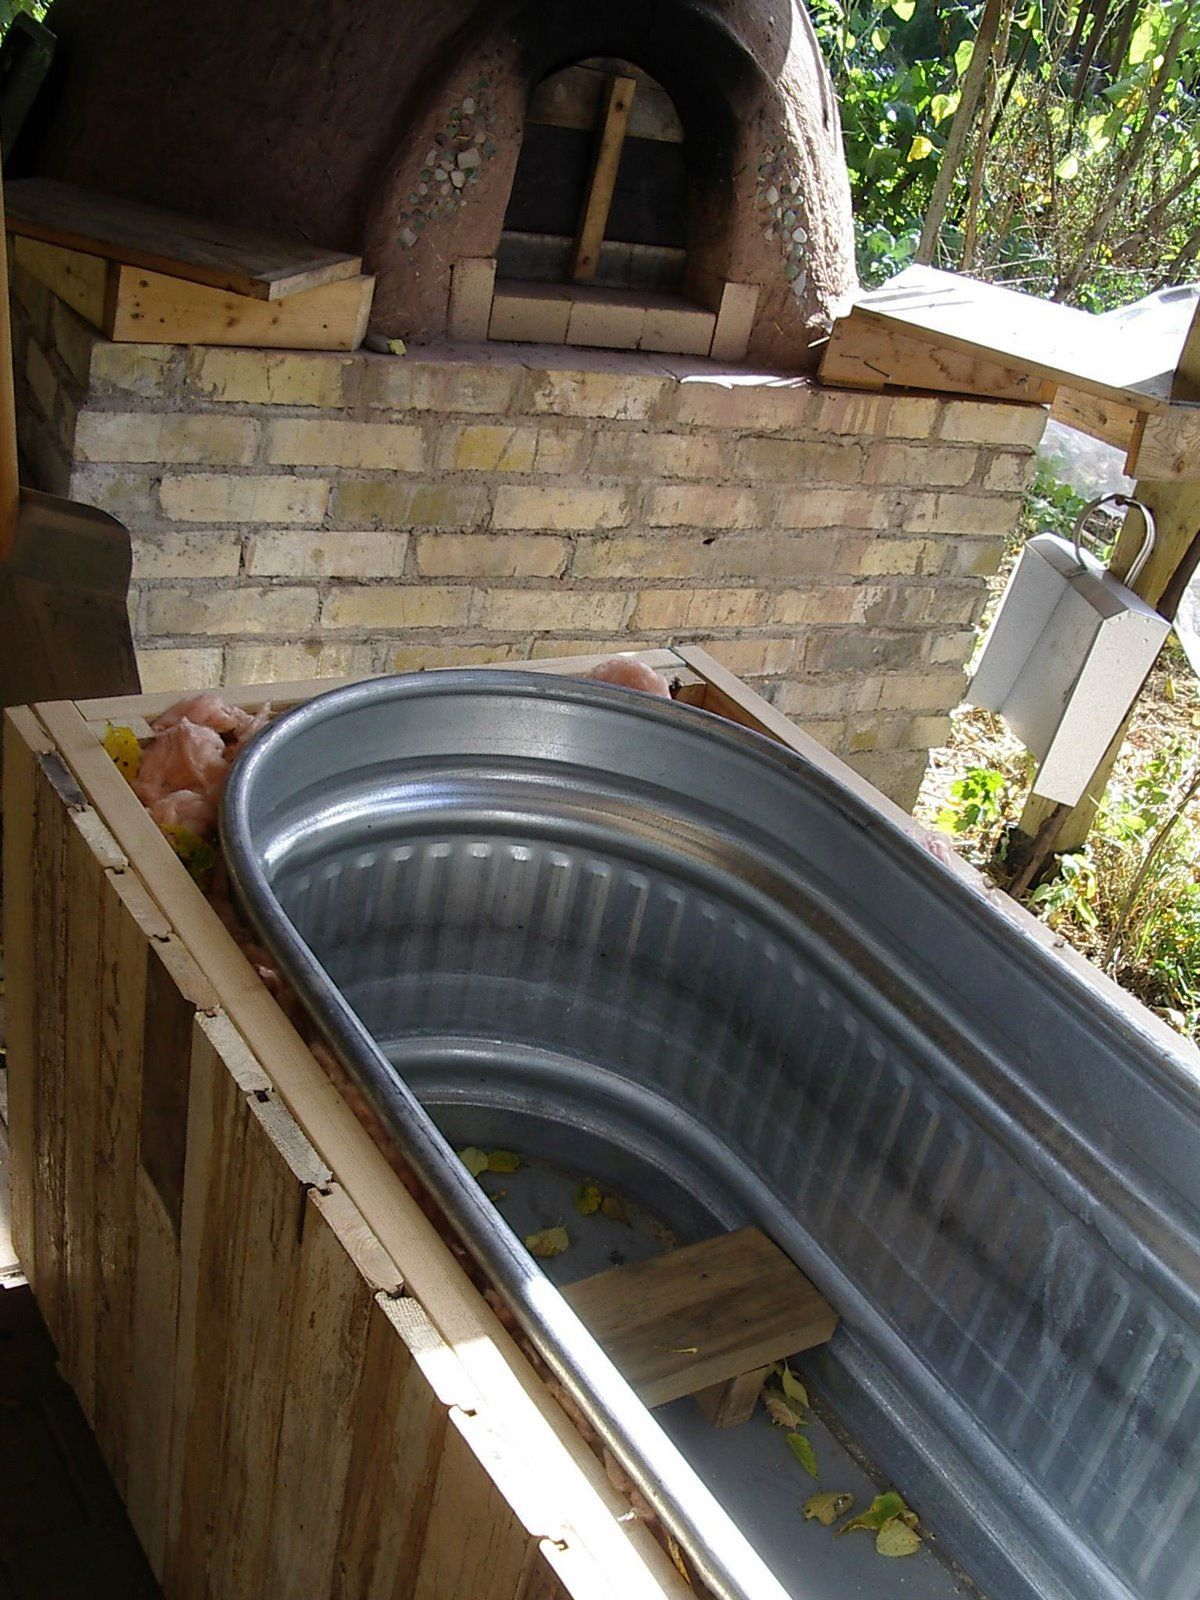 Medium Crop Of Homemade Hot Tub